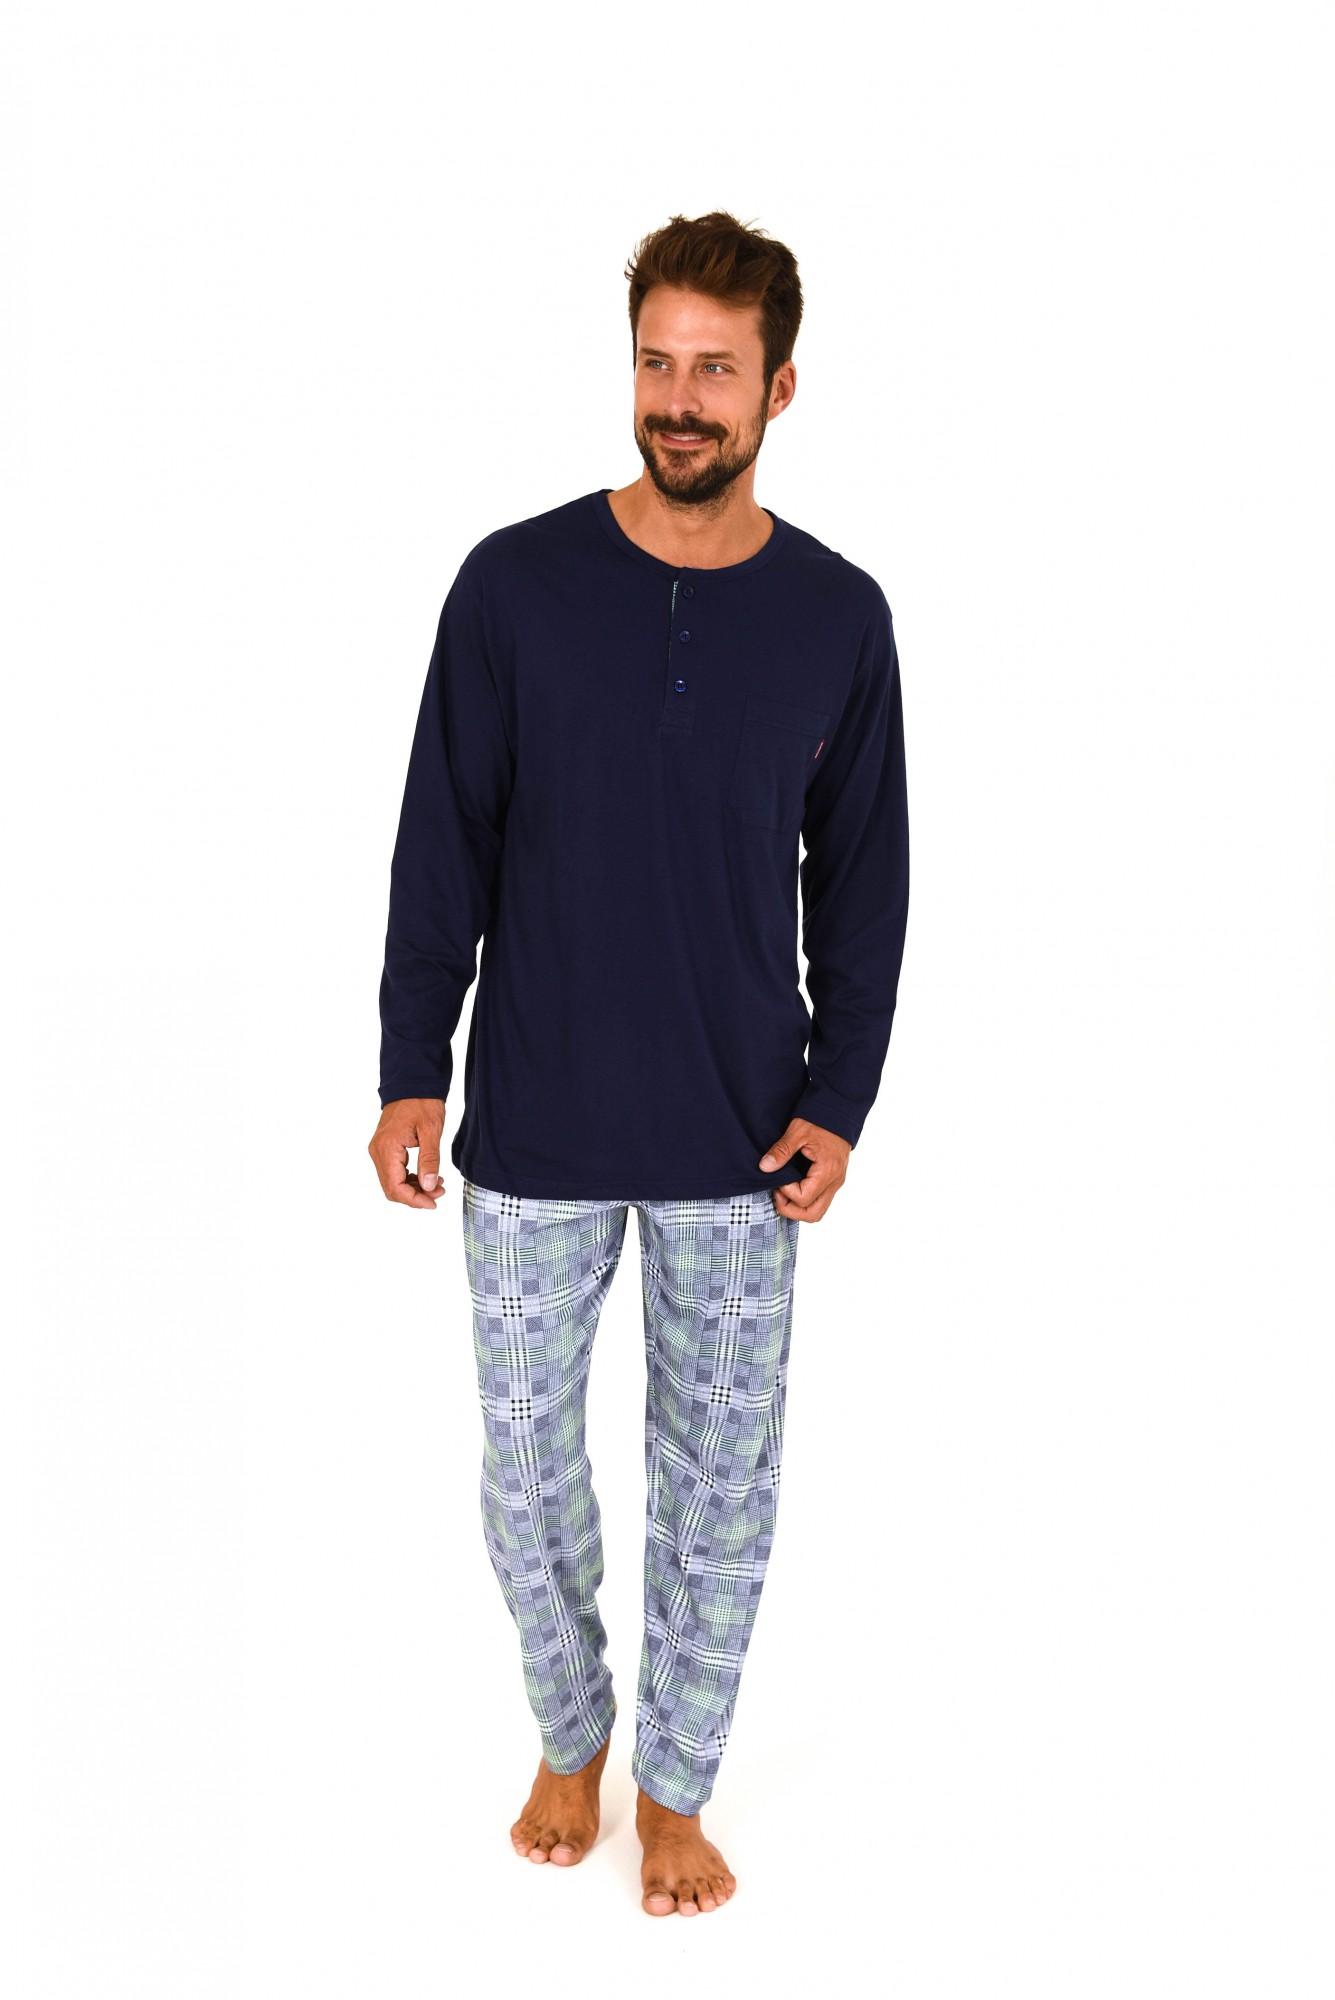 Herren Pyjama langarm Schlafanzug Mix & Match Optik – karierte Hose – 101 90 601